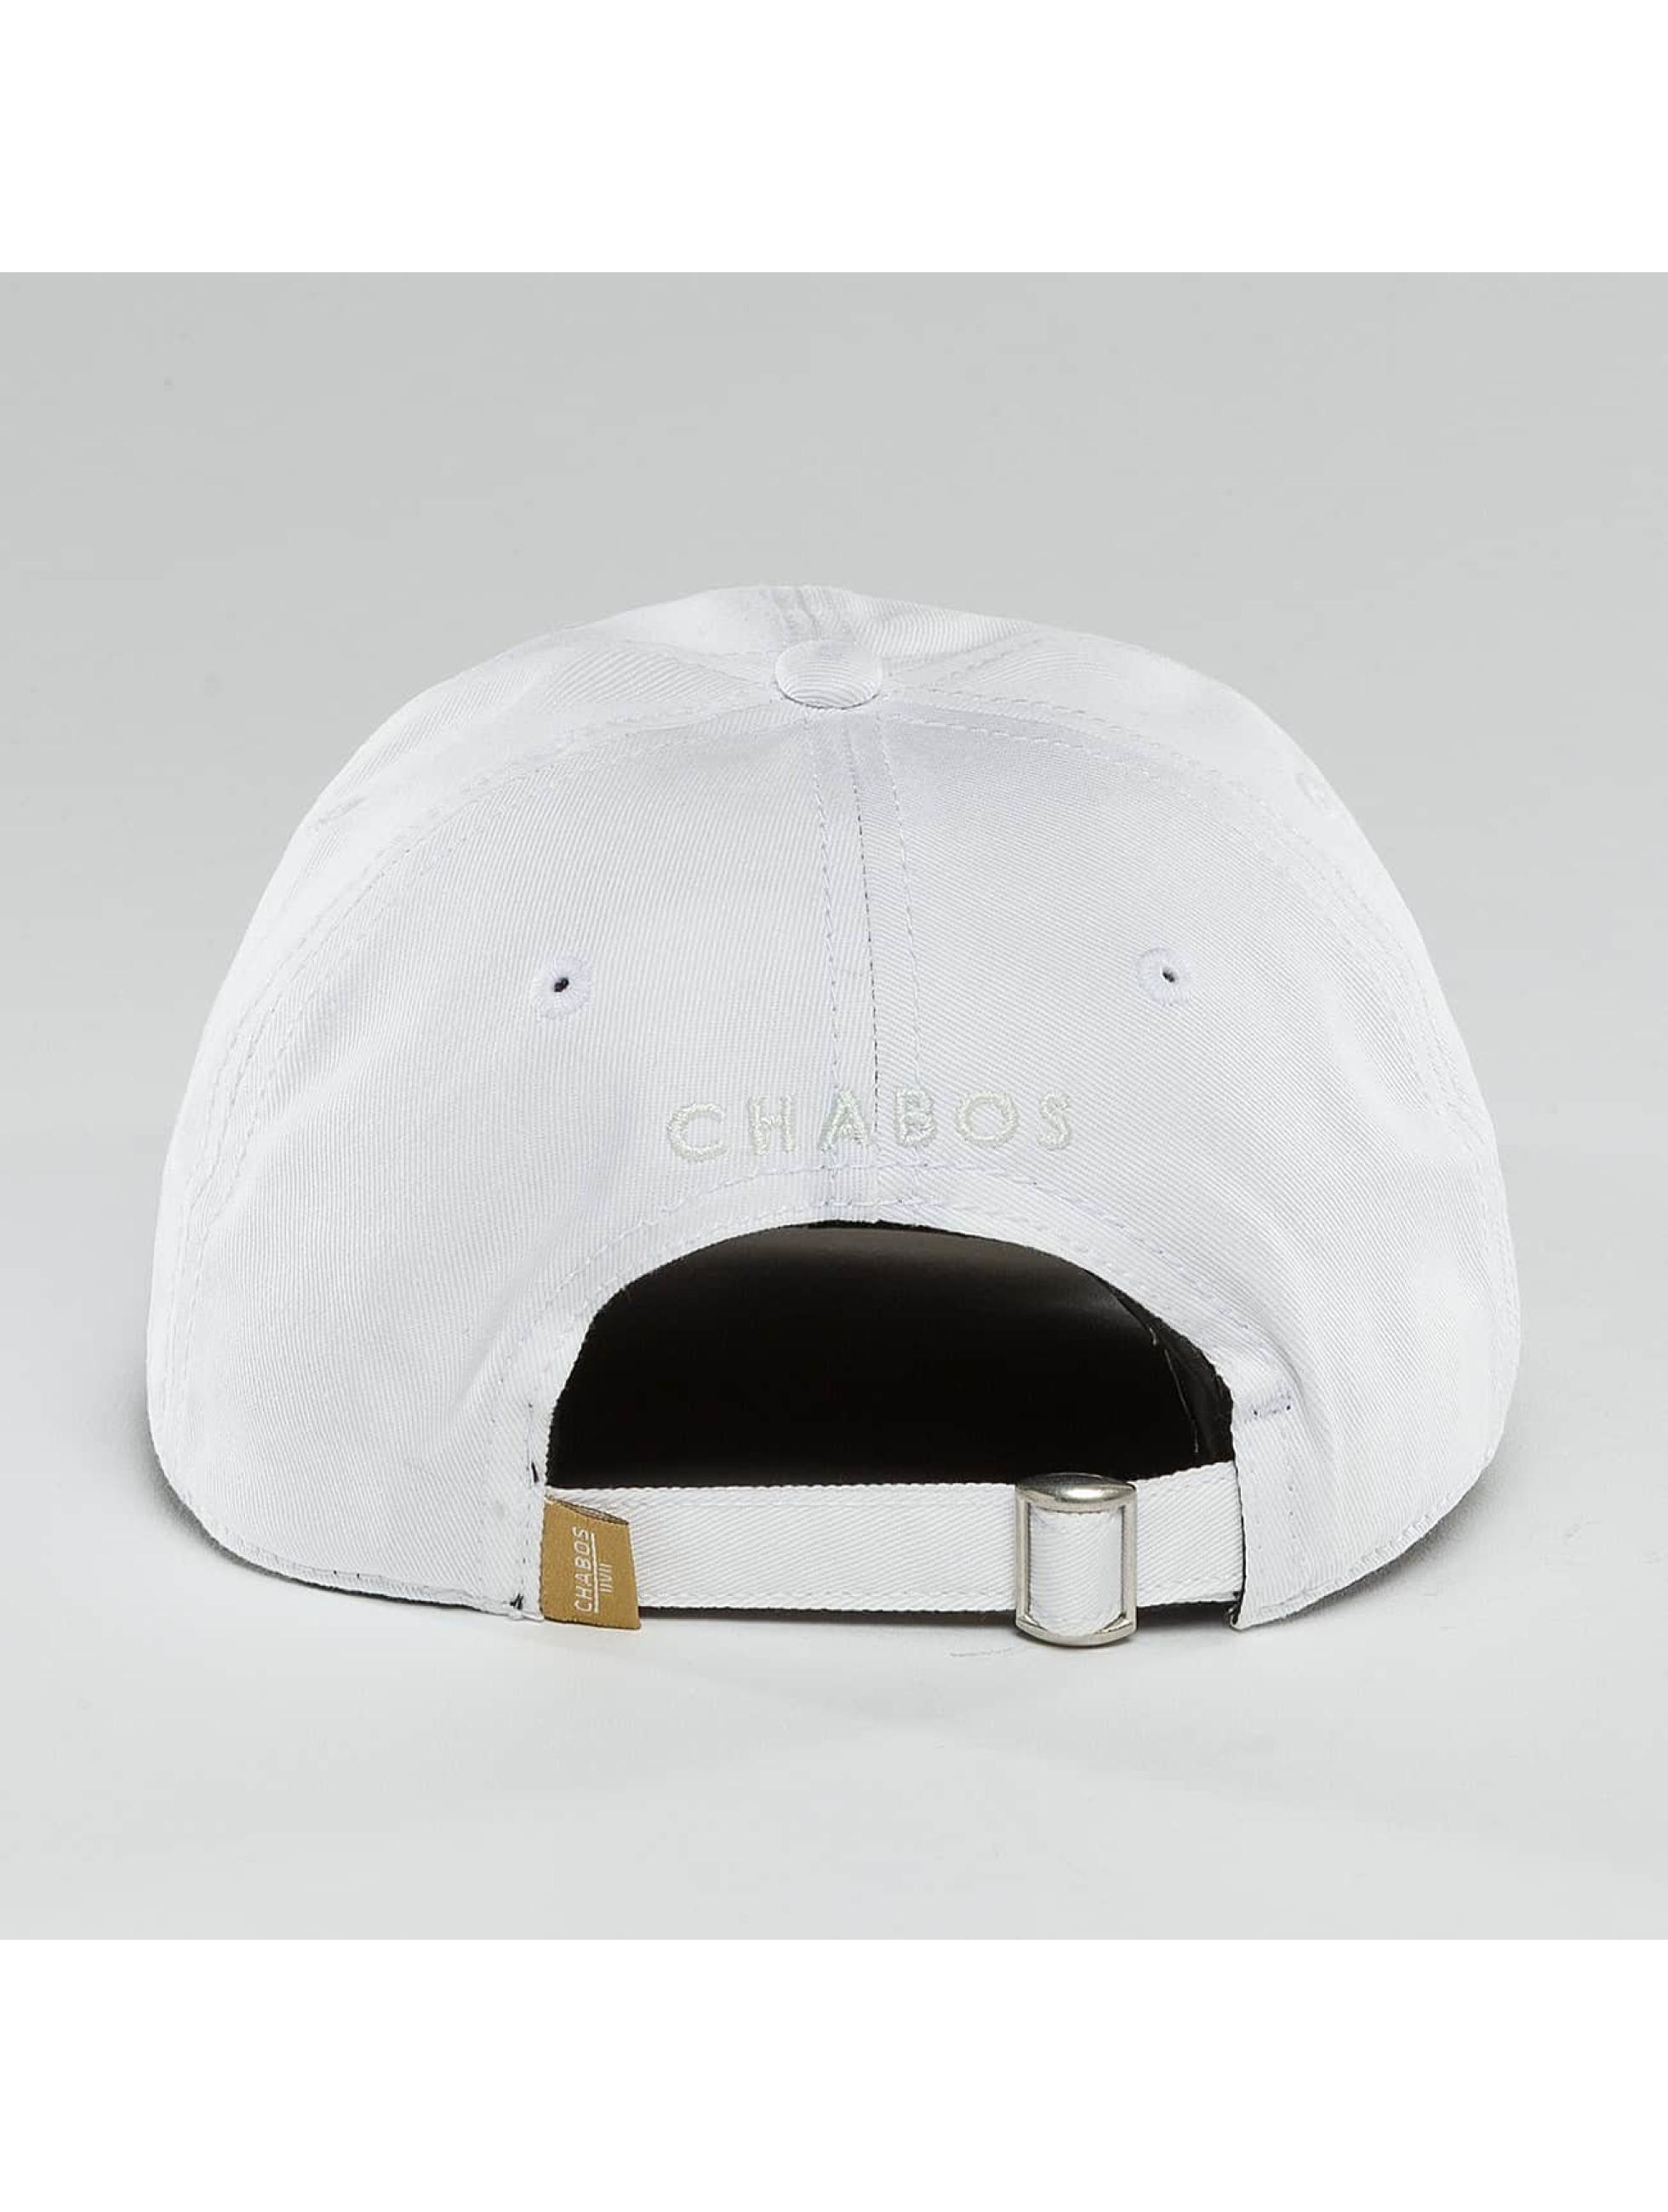 CHABOS IIVII Casquette Snapback & Strapback Palazzo blanc